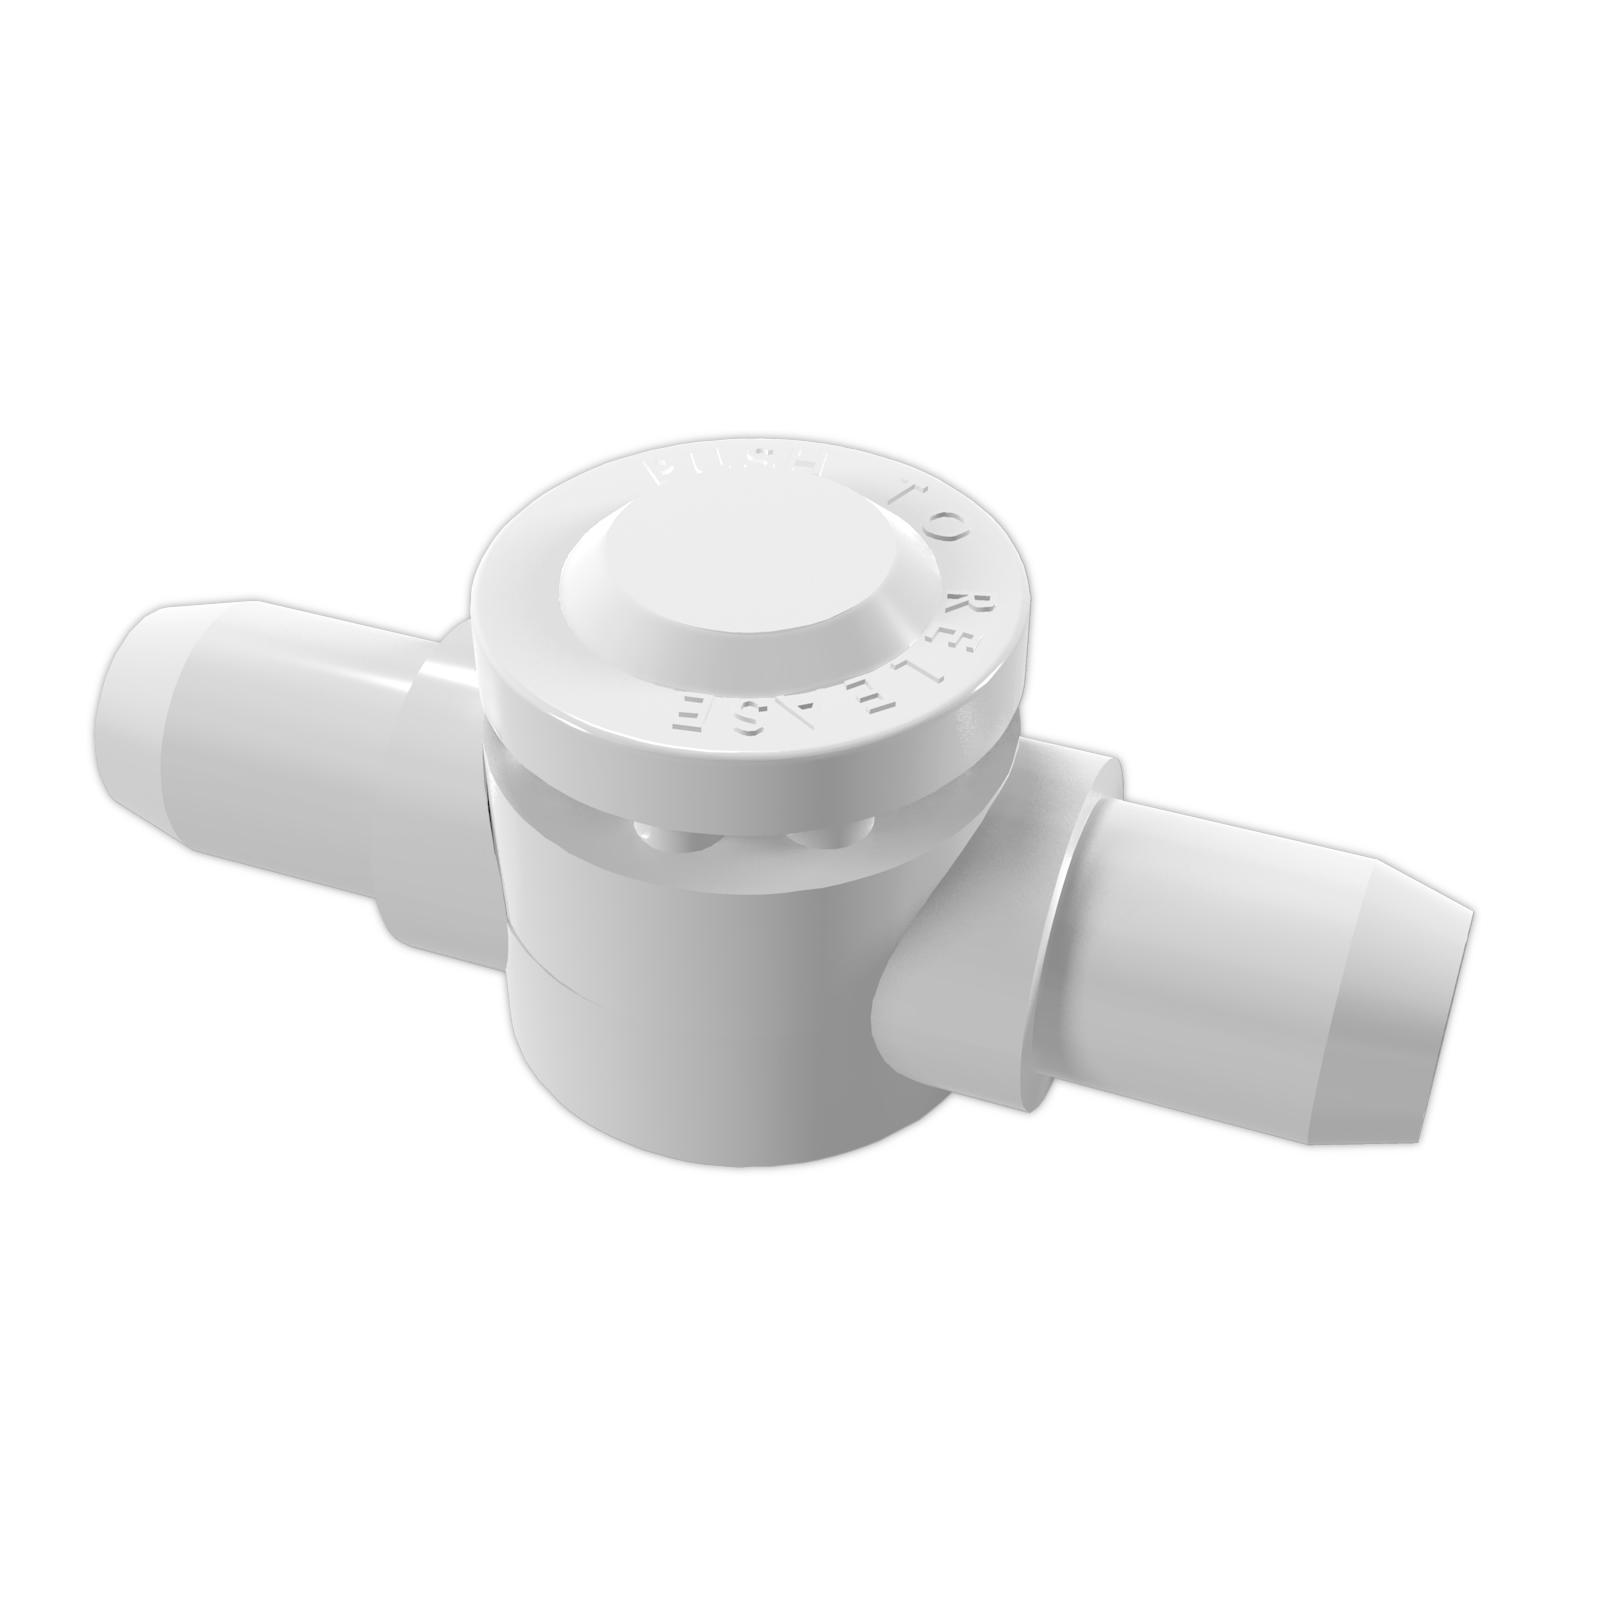 Internal 2-Way Adjustable Elbow - White